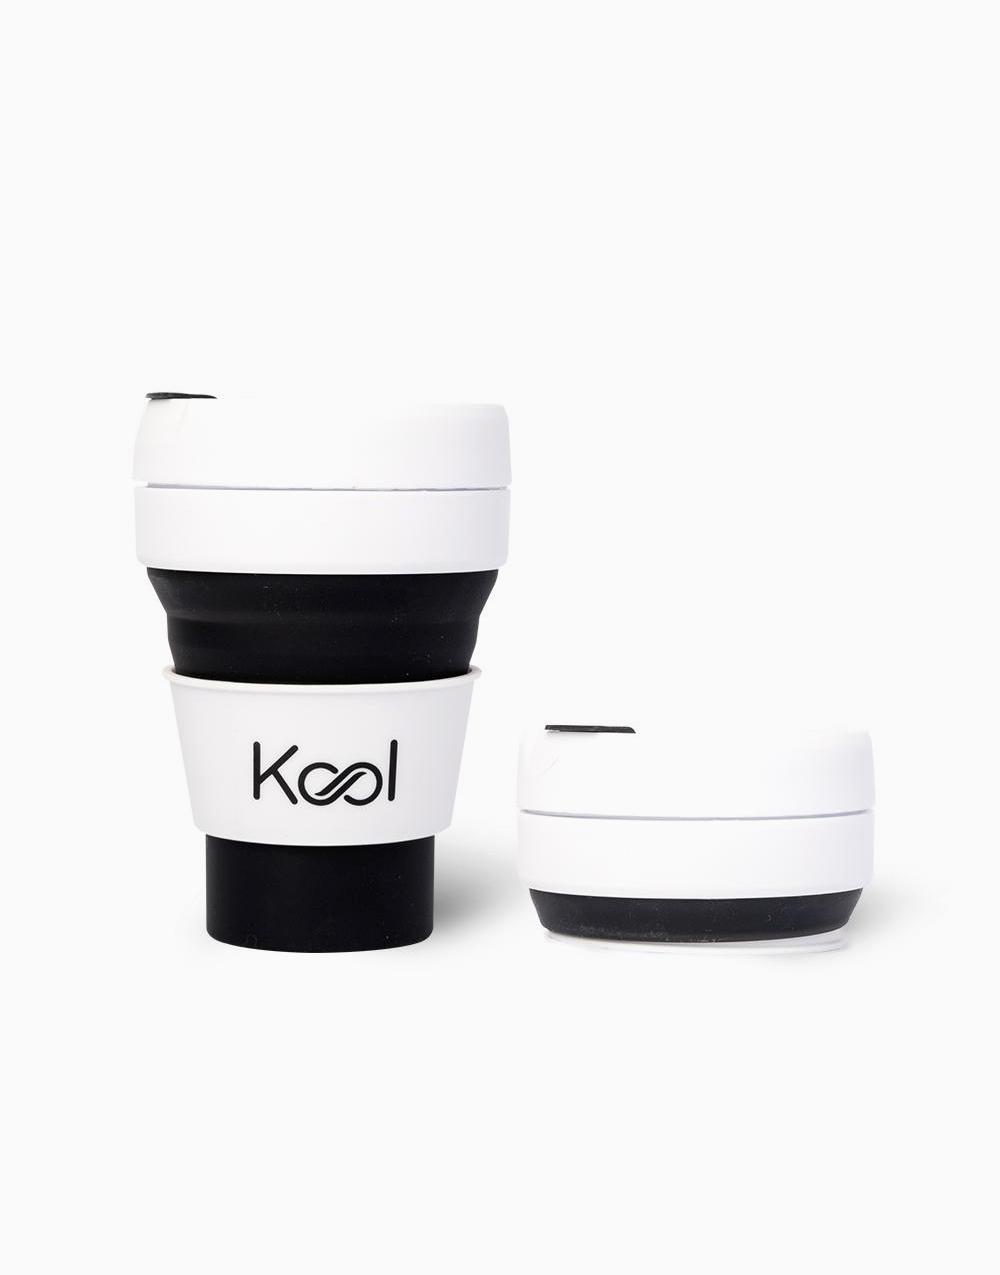 Kool Foldable Cup (355ml) by Kool   Midnight